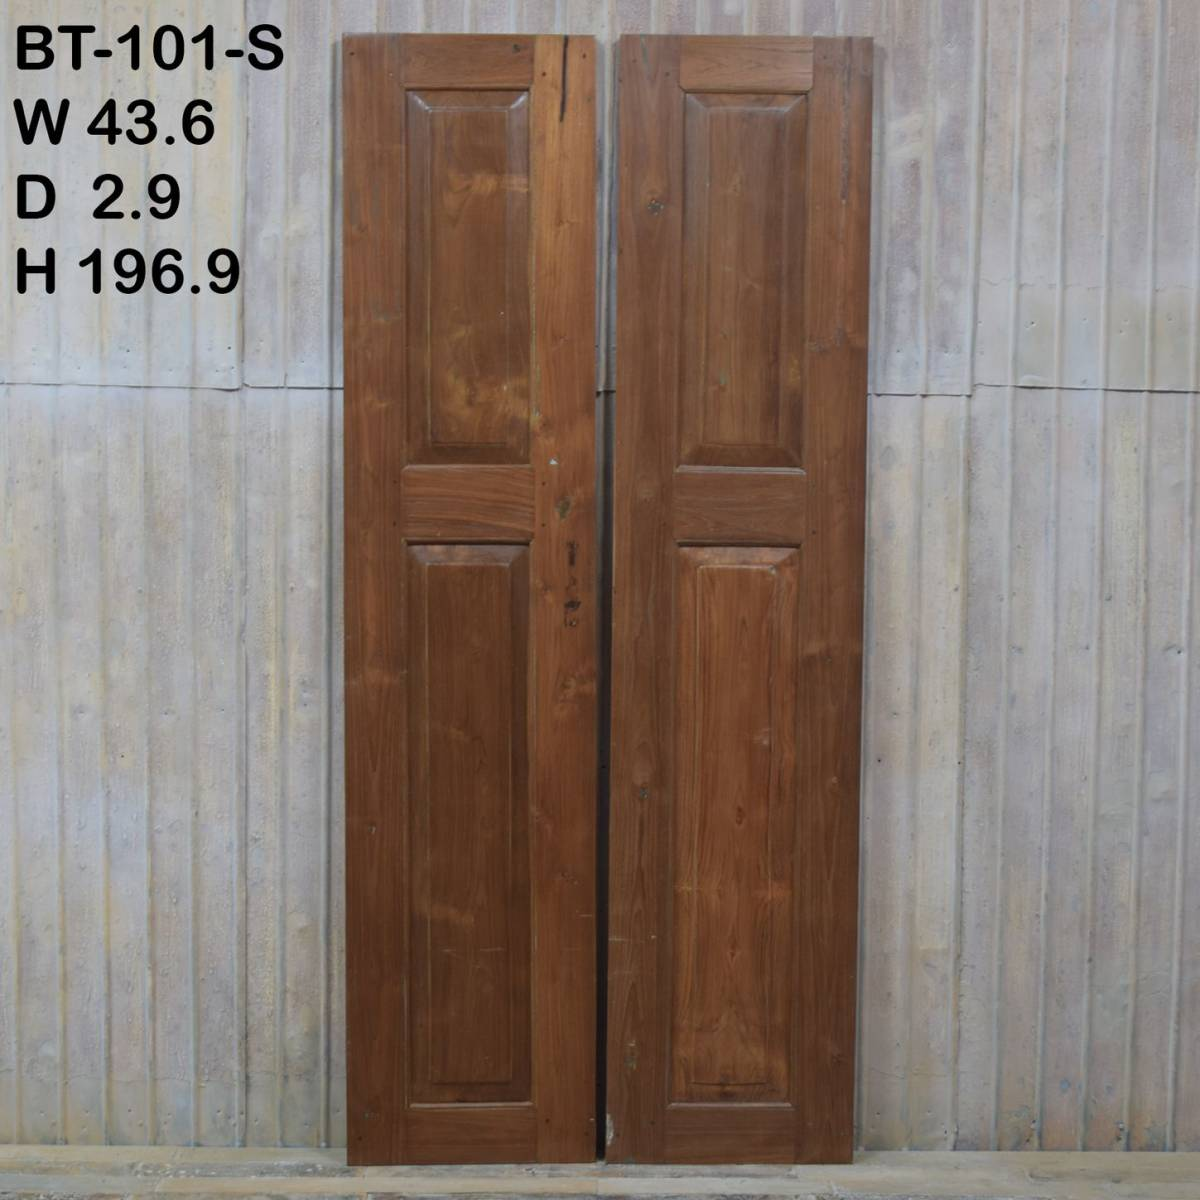 S-101〈即決〉W87×H197 ドアノブ外し穴修復済み 観音開きアンティークドア 2枚組 店舗リノベーション 扉 古い洋館の木製建具 ftg